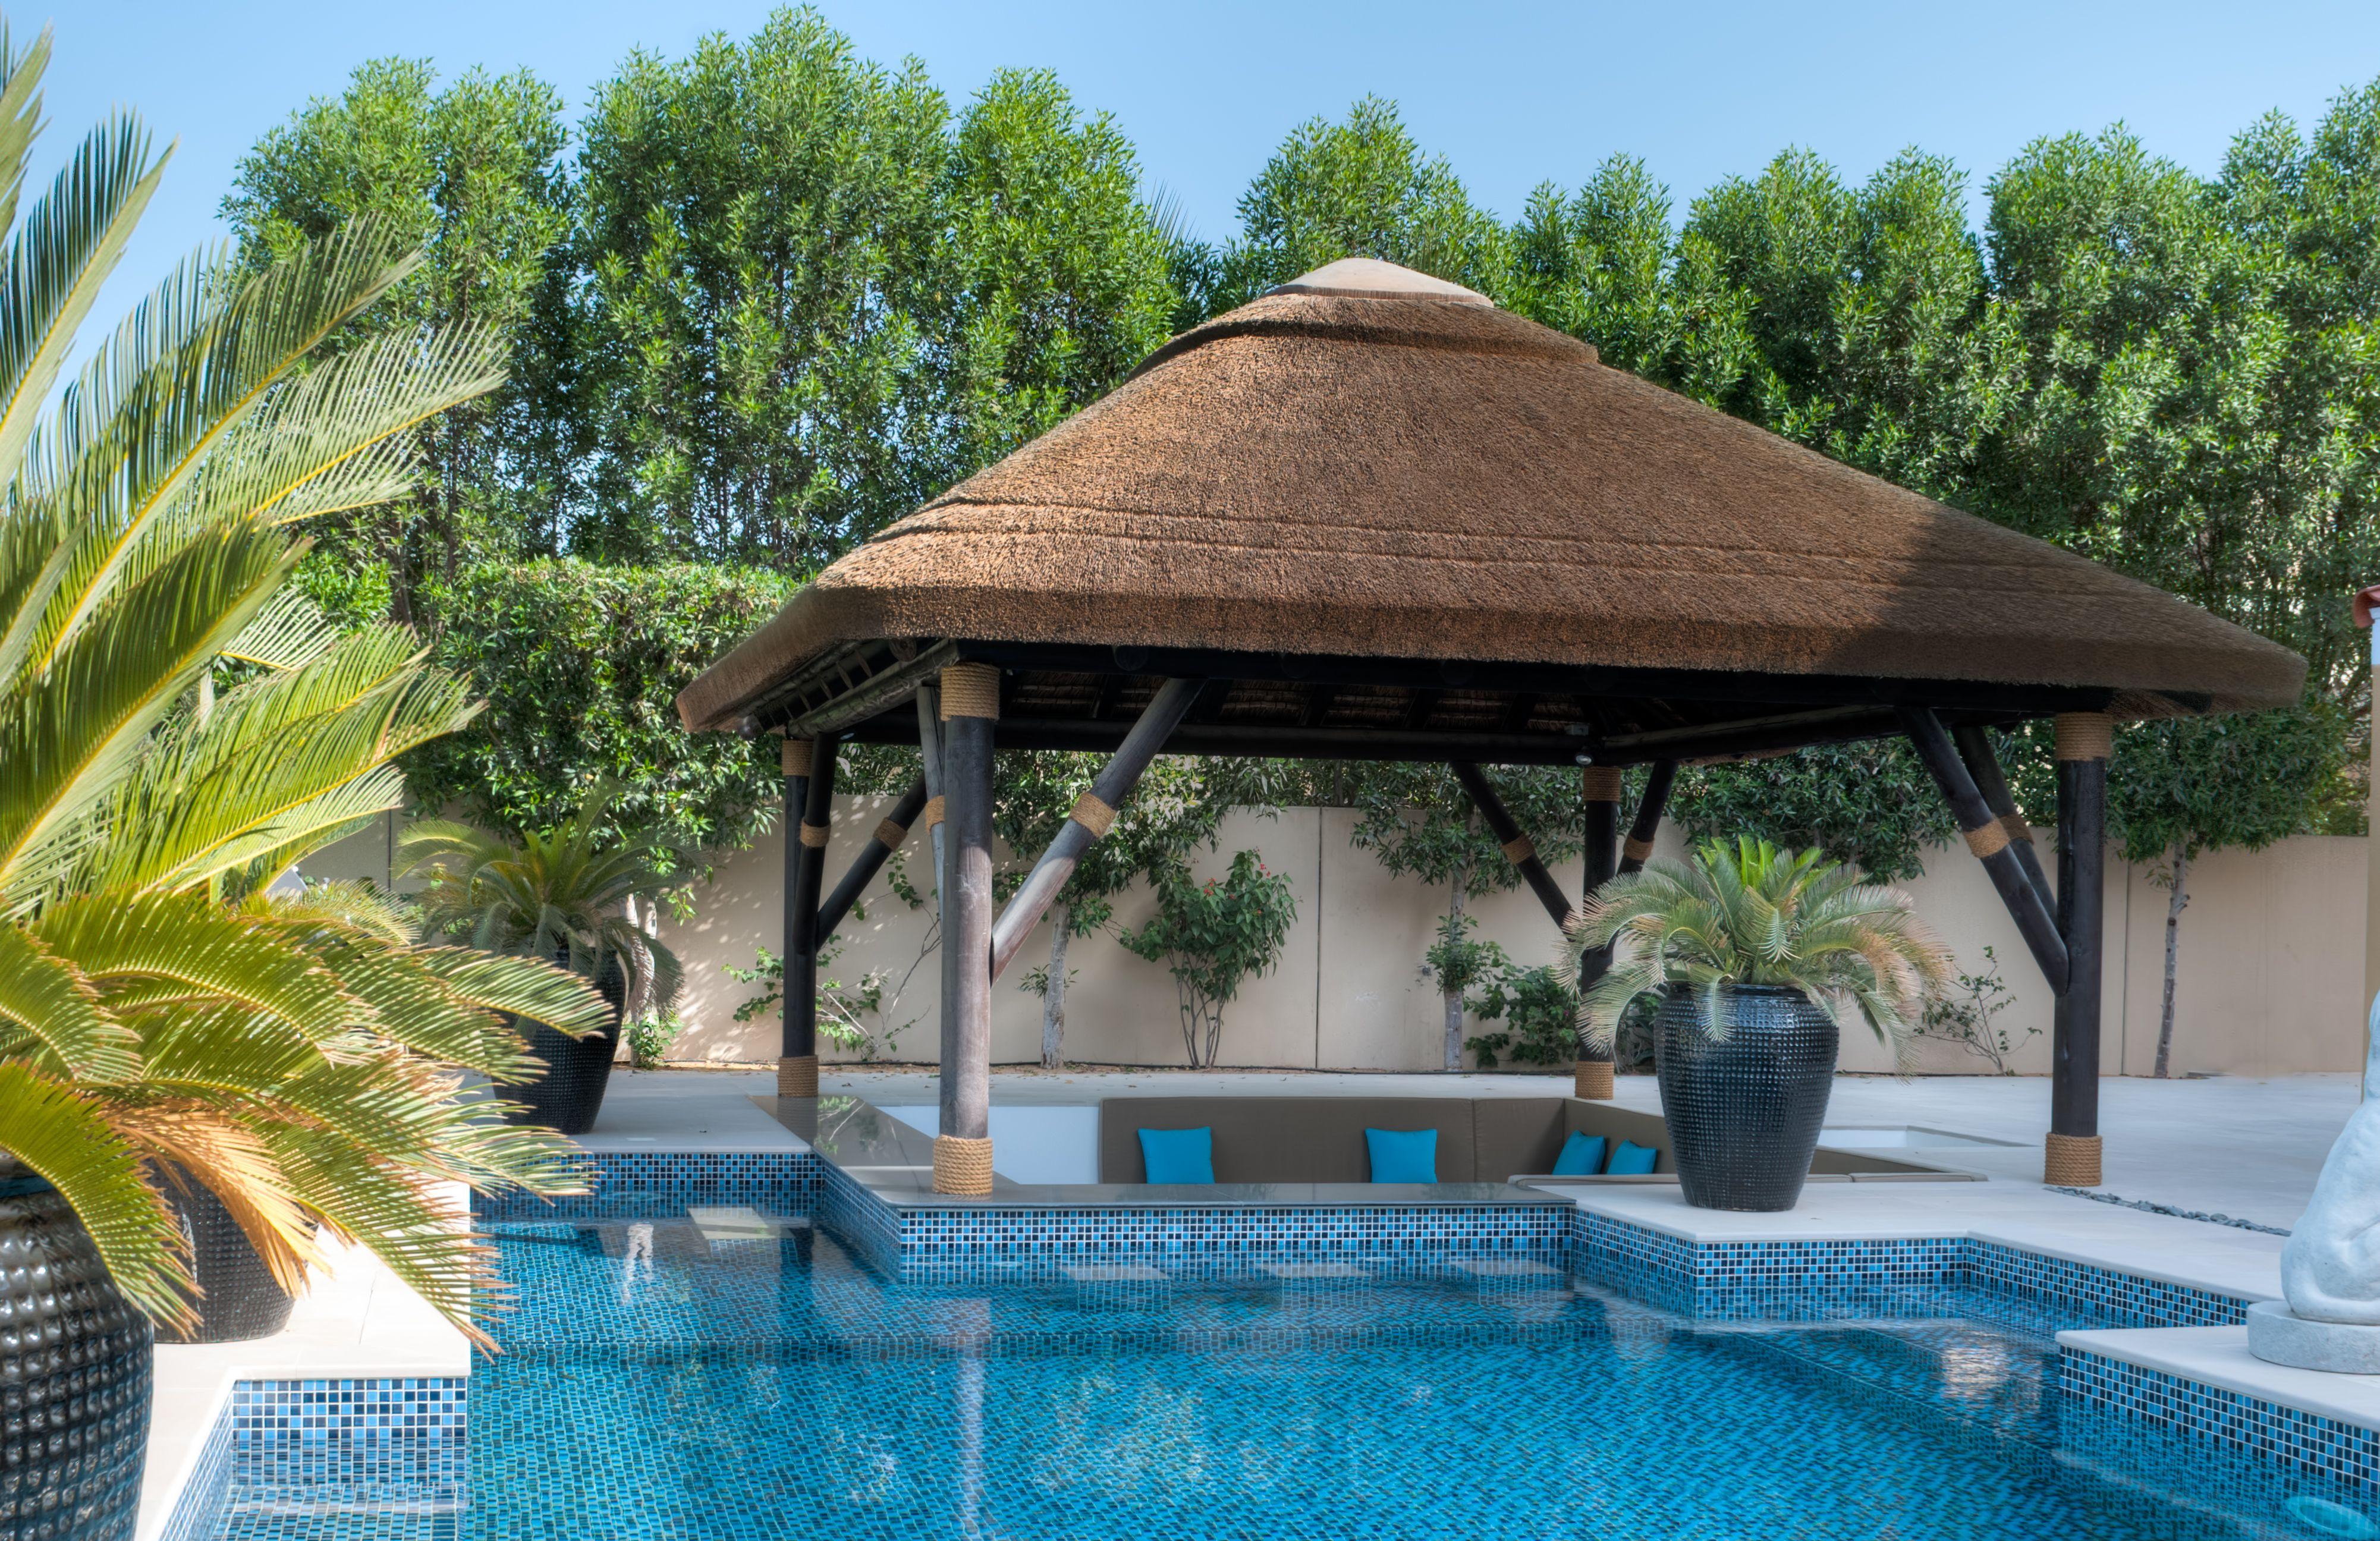 Pool Bar Perfectly Shaded With A Thatch Gazebo Gazebo Poolbar Pool Outdoor Gazebo Diy Gazebo Backyard Beach